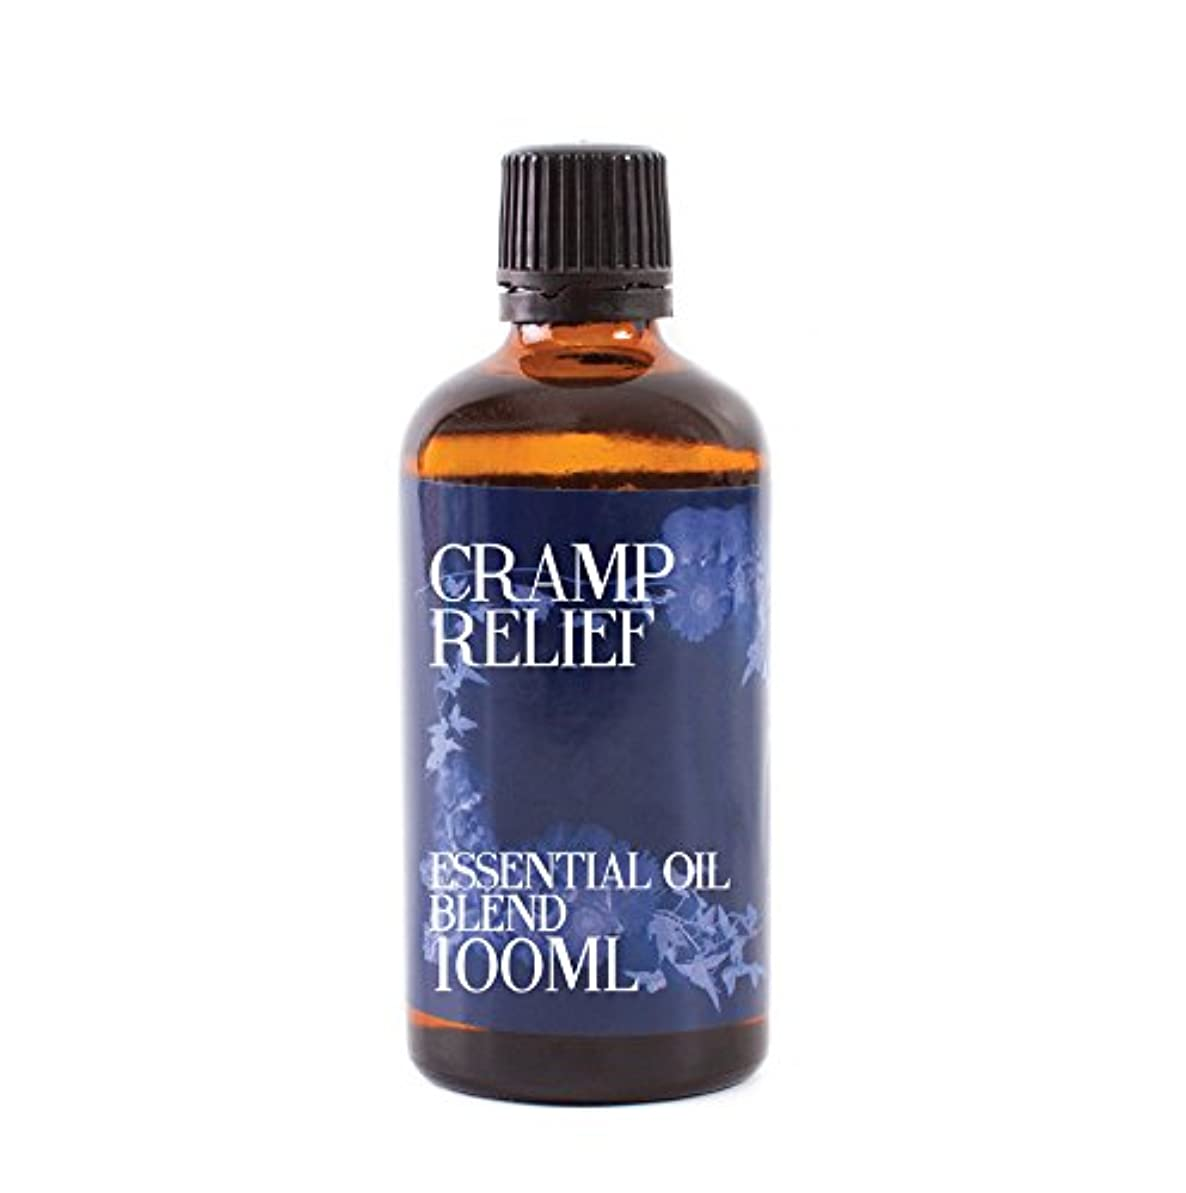 病的必要条件見込みMystix London   Cramp Relief Essential Oil Blend - 100ml - 100% Pure